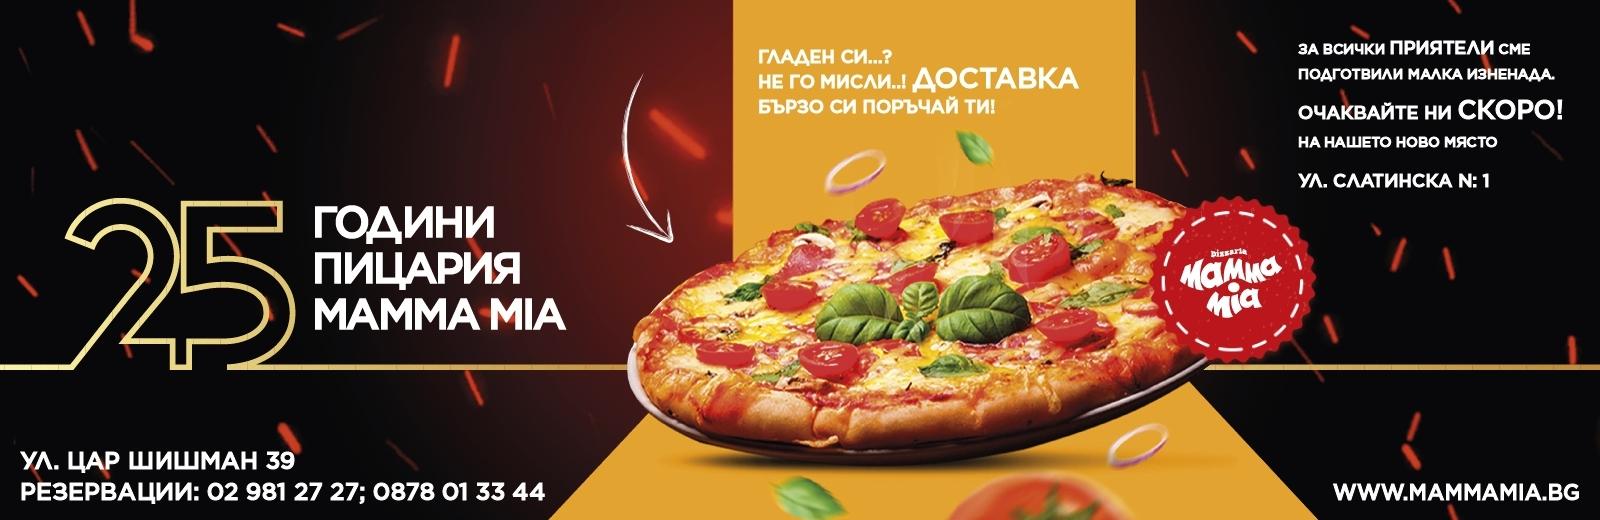 Pizzaria MammaMia